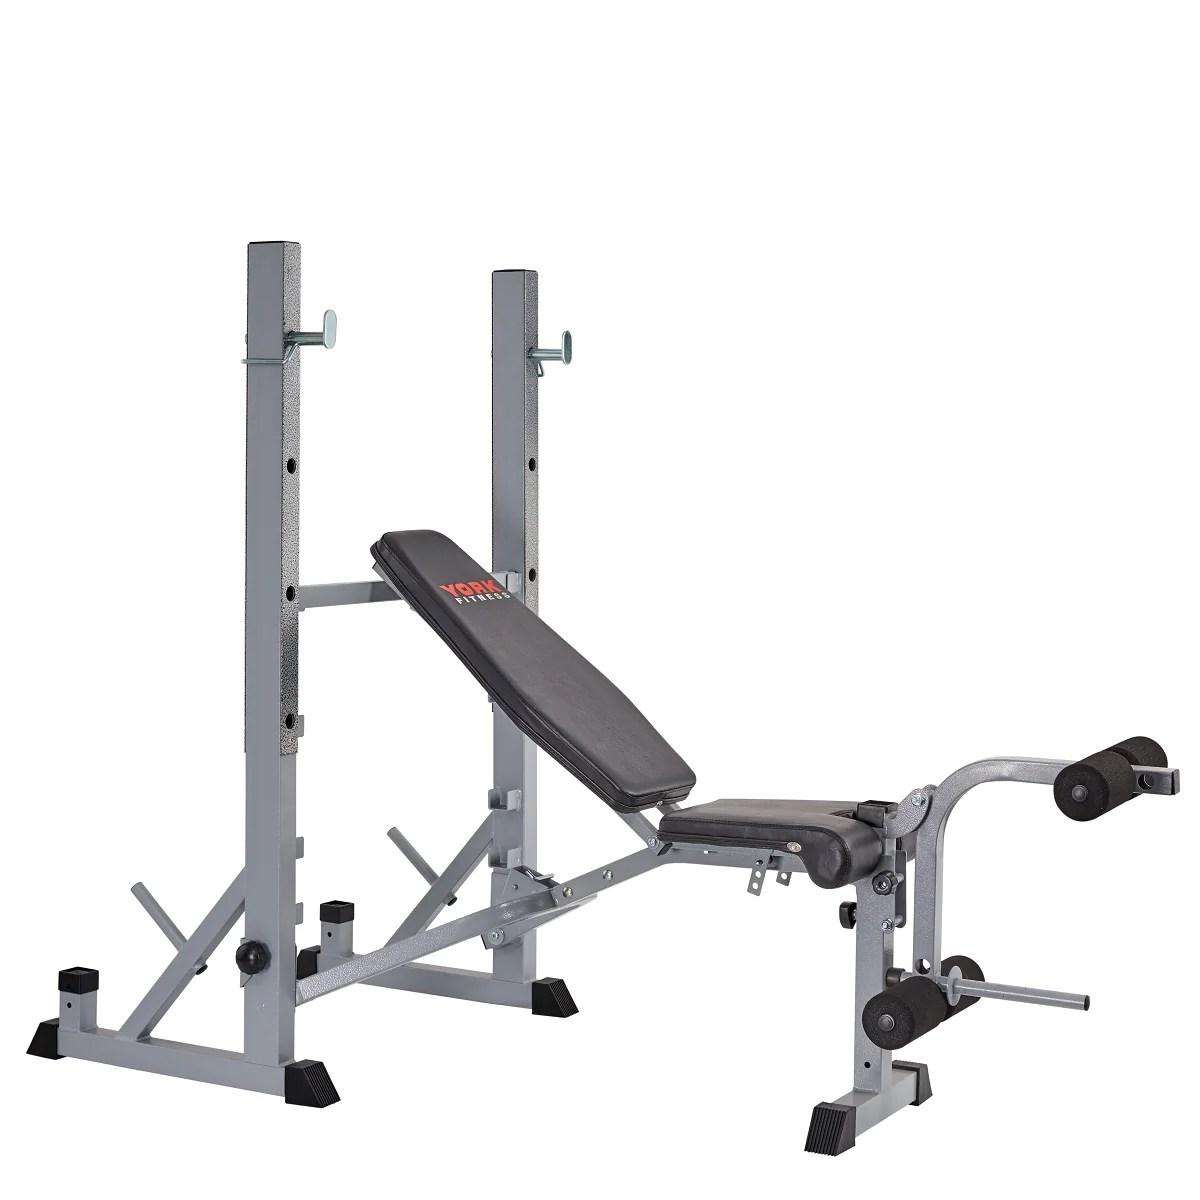 York Fitness 540 Heavy Duty Folding Barbell Bench Squat